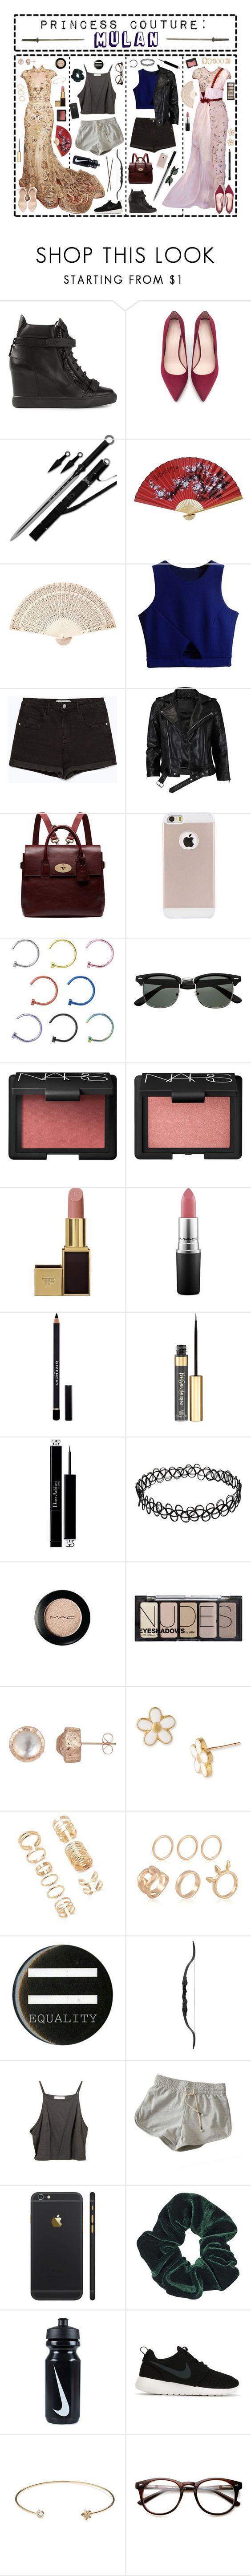 """- ̗̀ Princess Couture: Mulan  ̖́-"" by i-get-a-little-bit-breathless ❤ liked on Polyvore featuring Zuhair Murad, Giuseppe Zanotti, Zara, VIPARO, Mulberry, NARS Cosmetics, Tom Ford, MAC Cosmetics, Givenchy and Yves Saint Laurent"